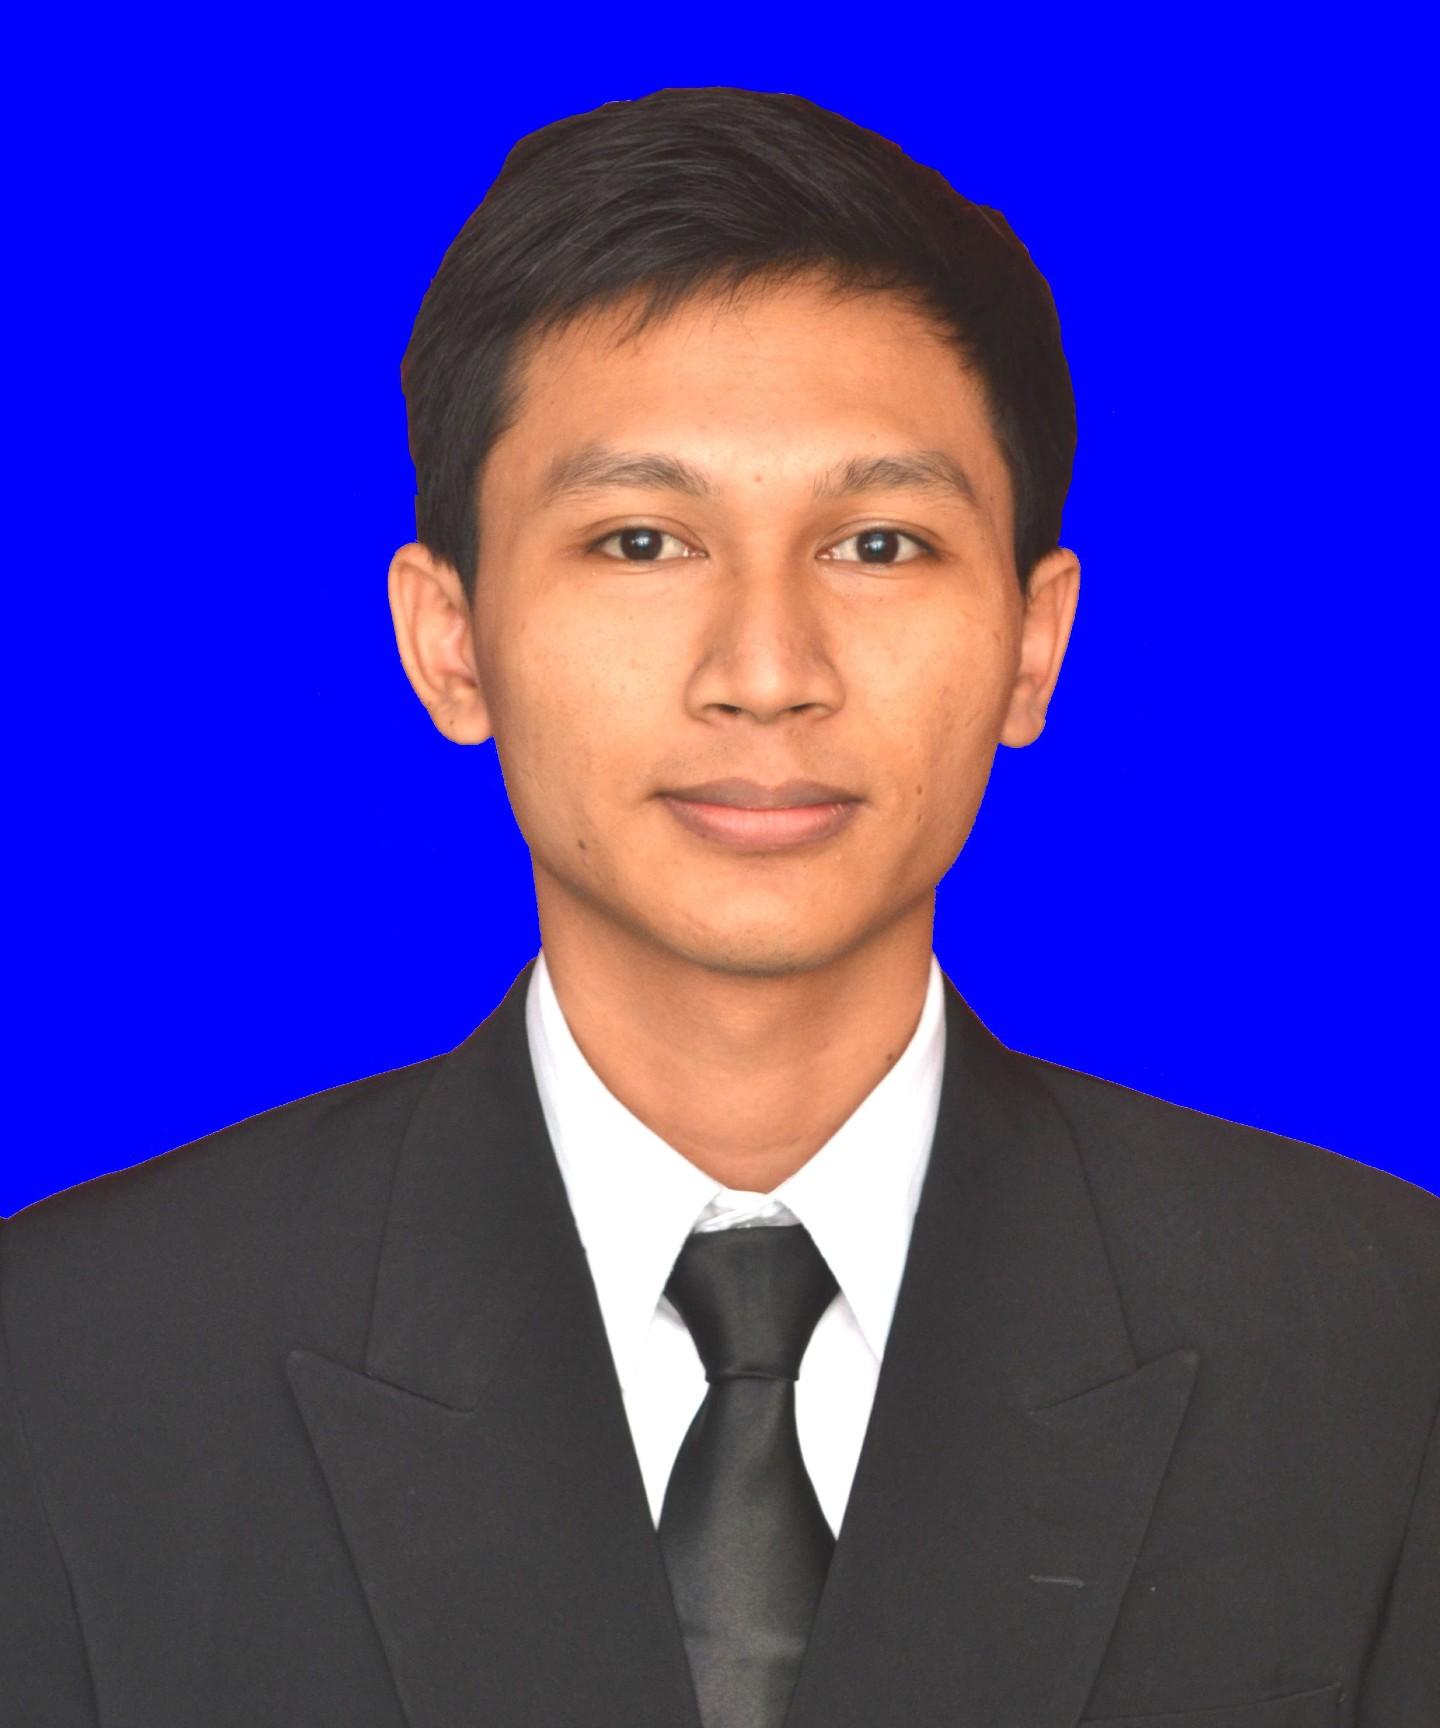 Sapta Suhardono, S.Pd., M.Sc